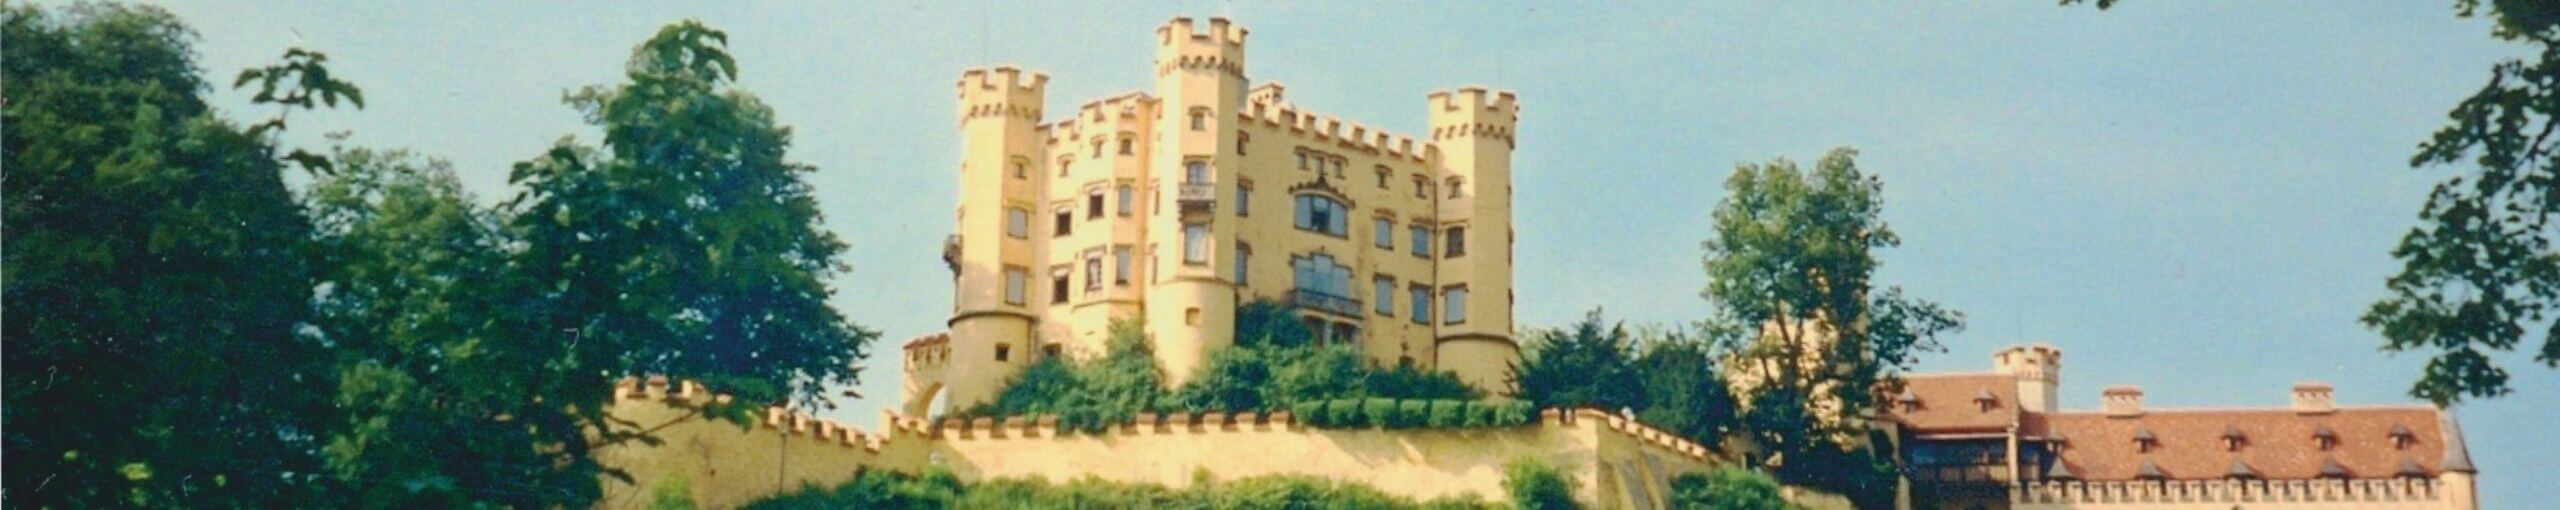 Castillo deHohenschwangau